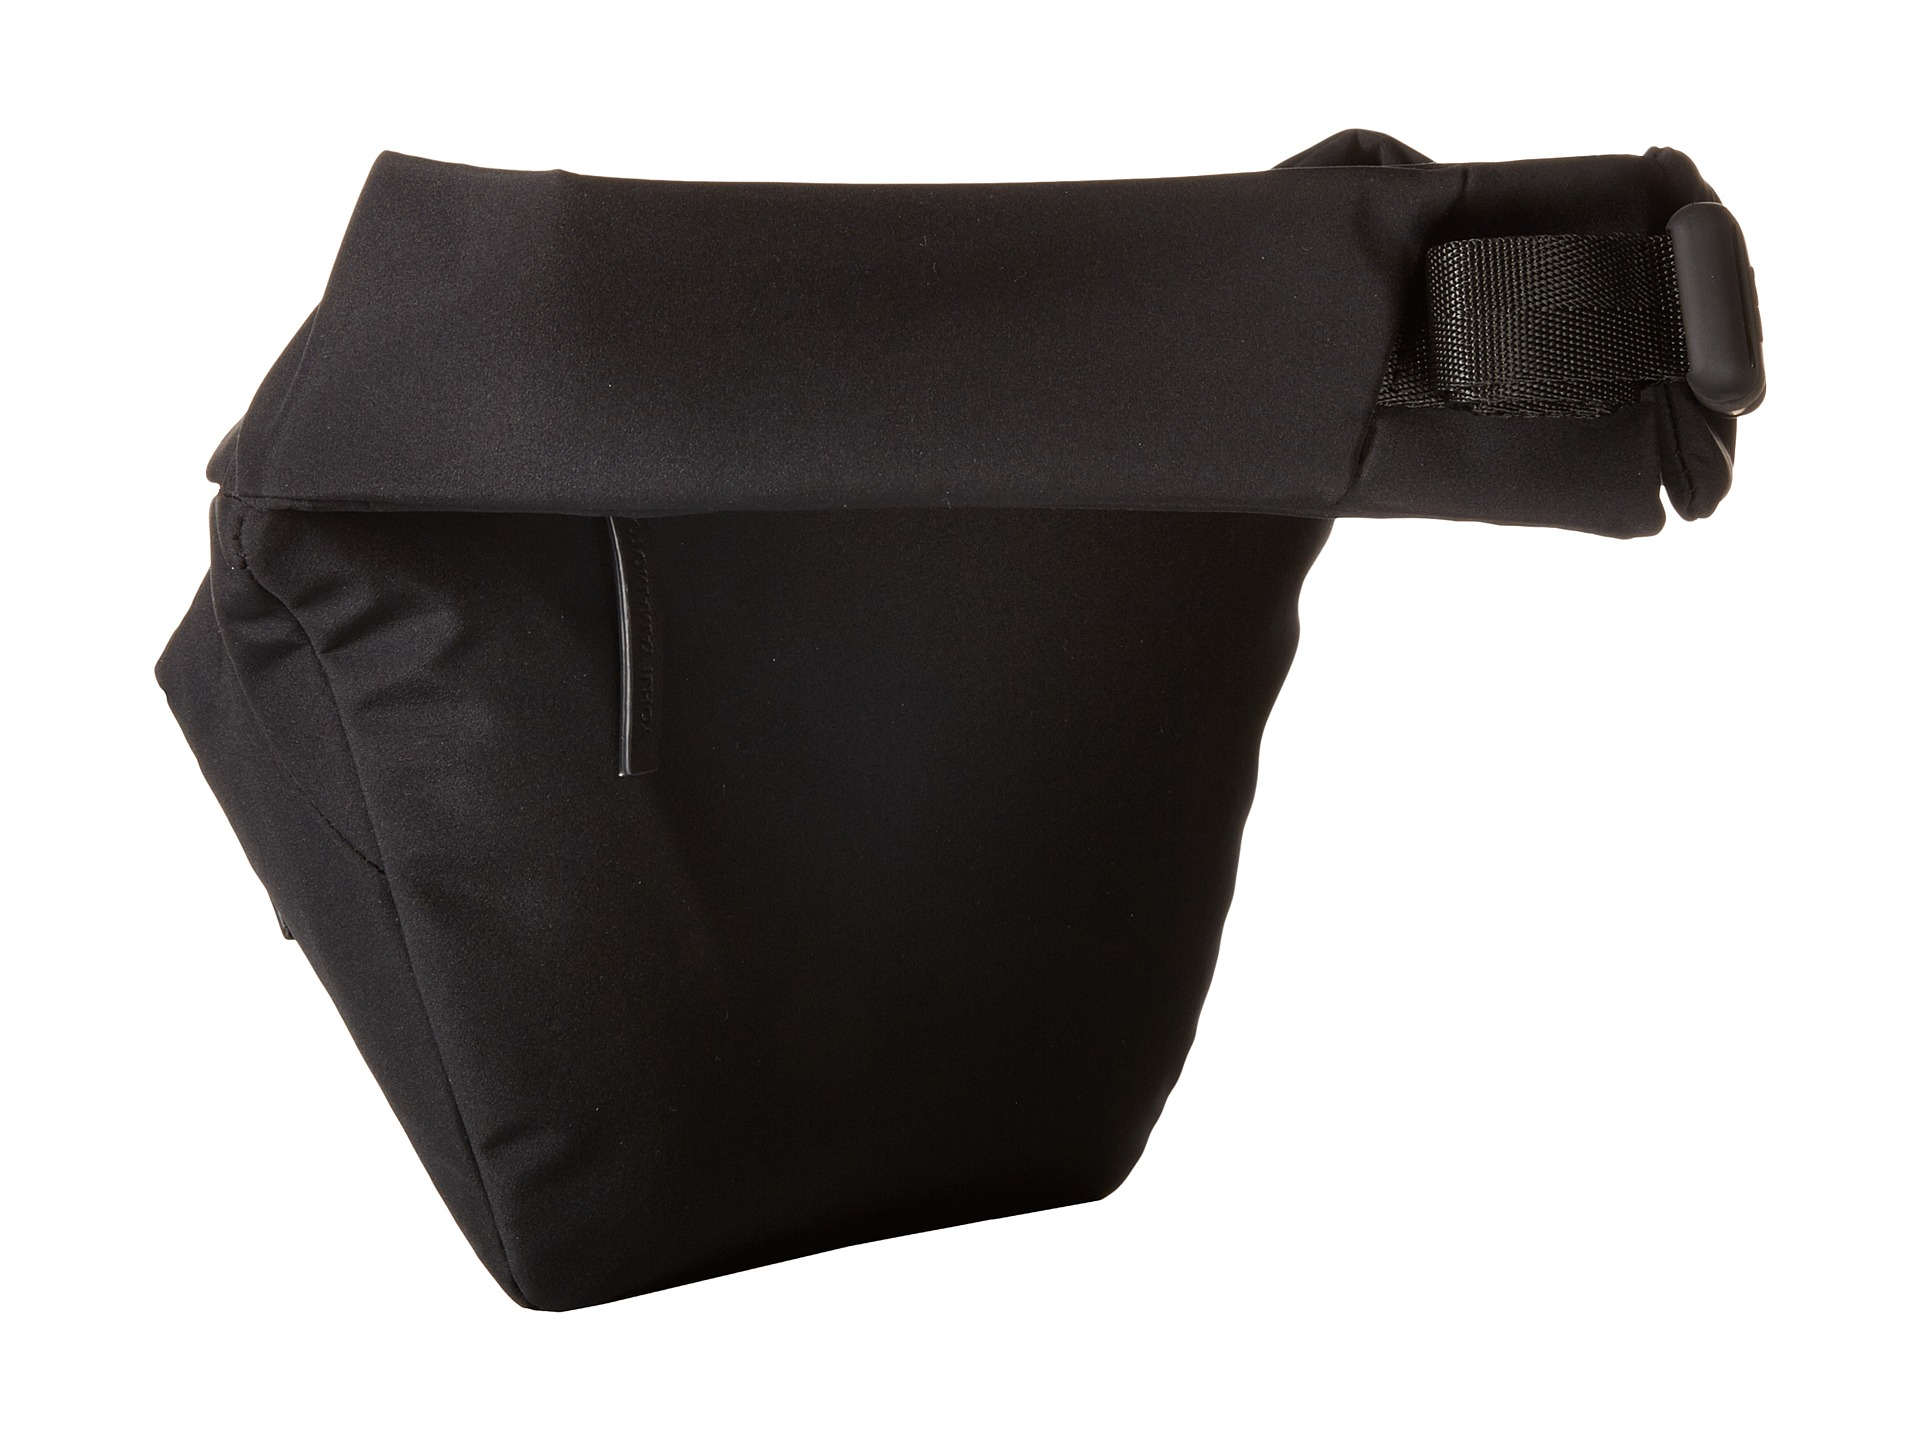 379c19e8be Lyst - Y-3 Qasa Fanny Pack in Black for Men